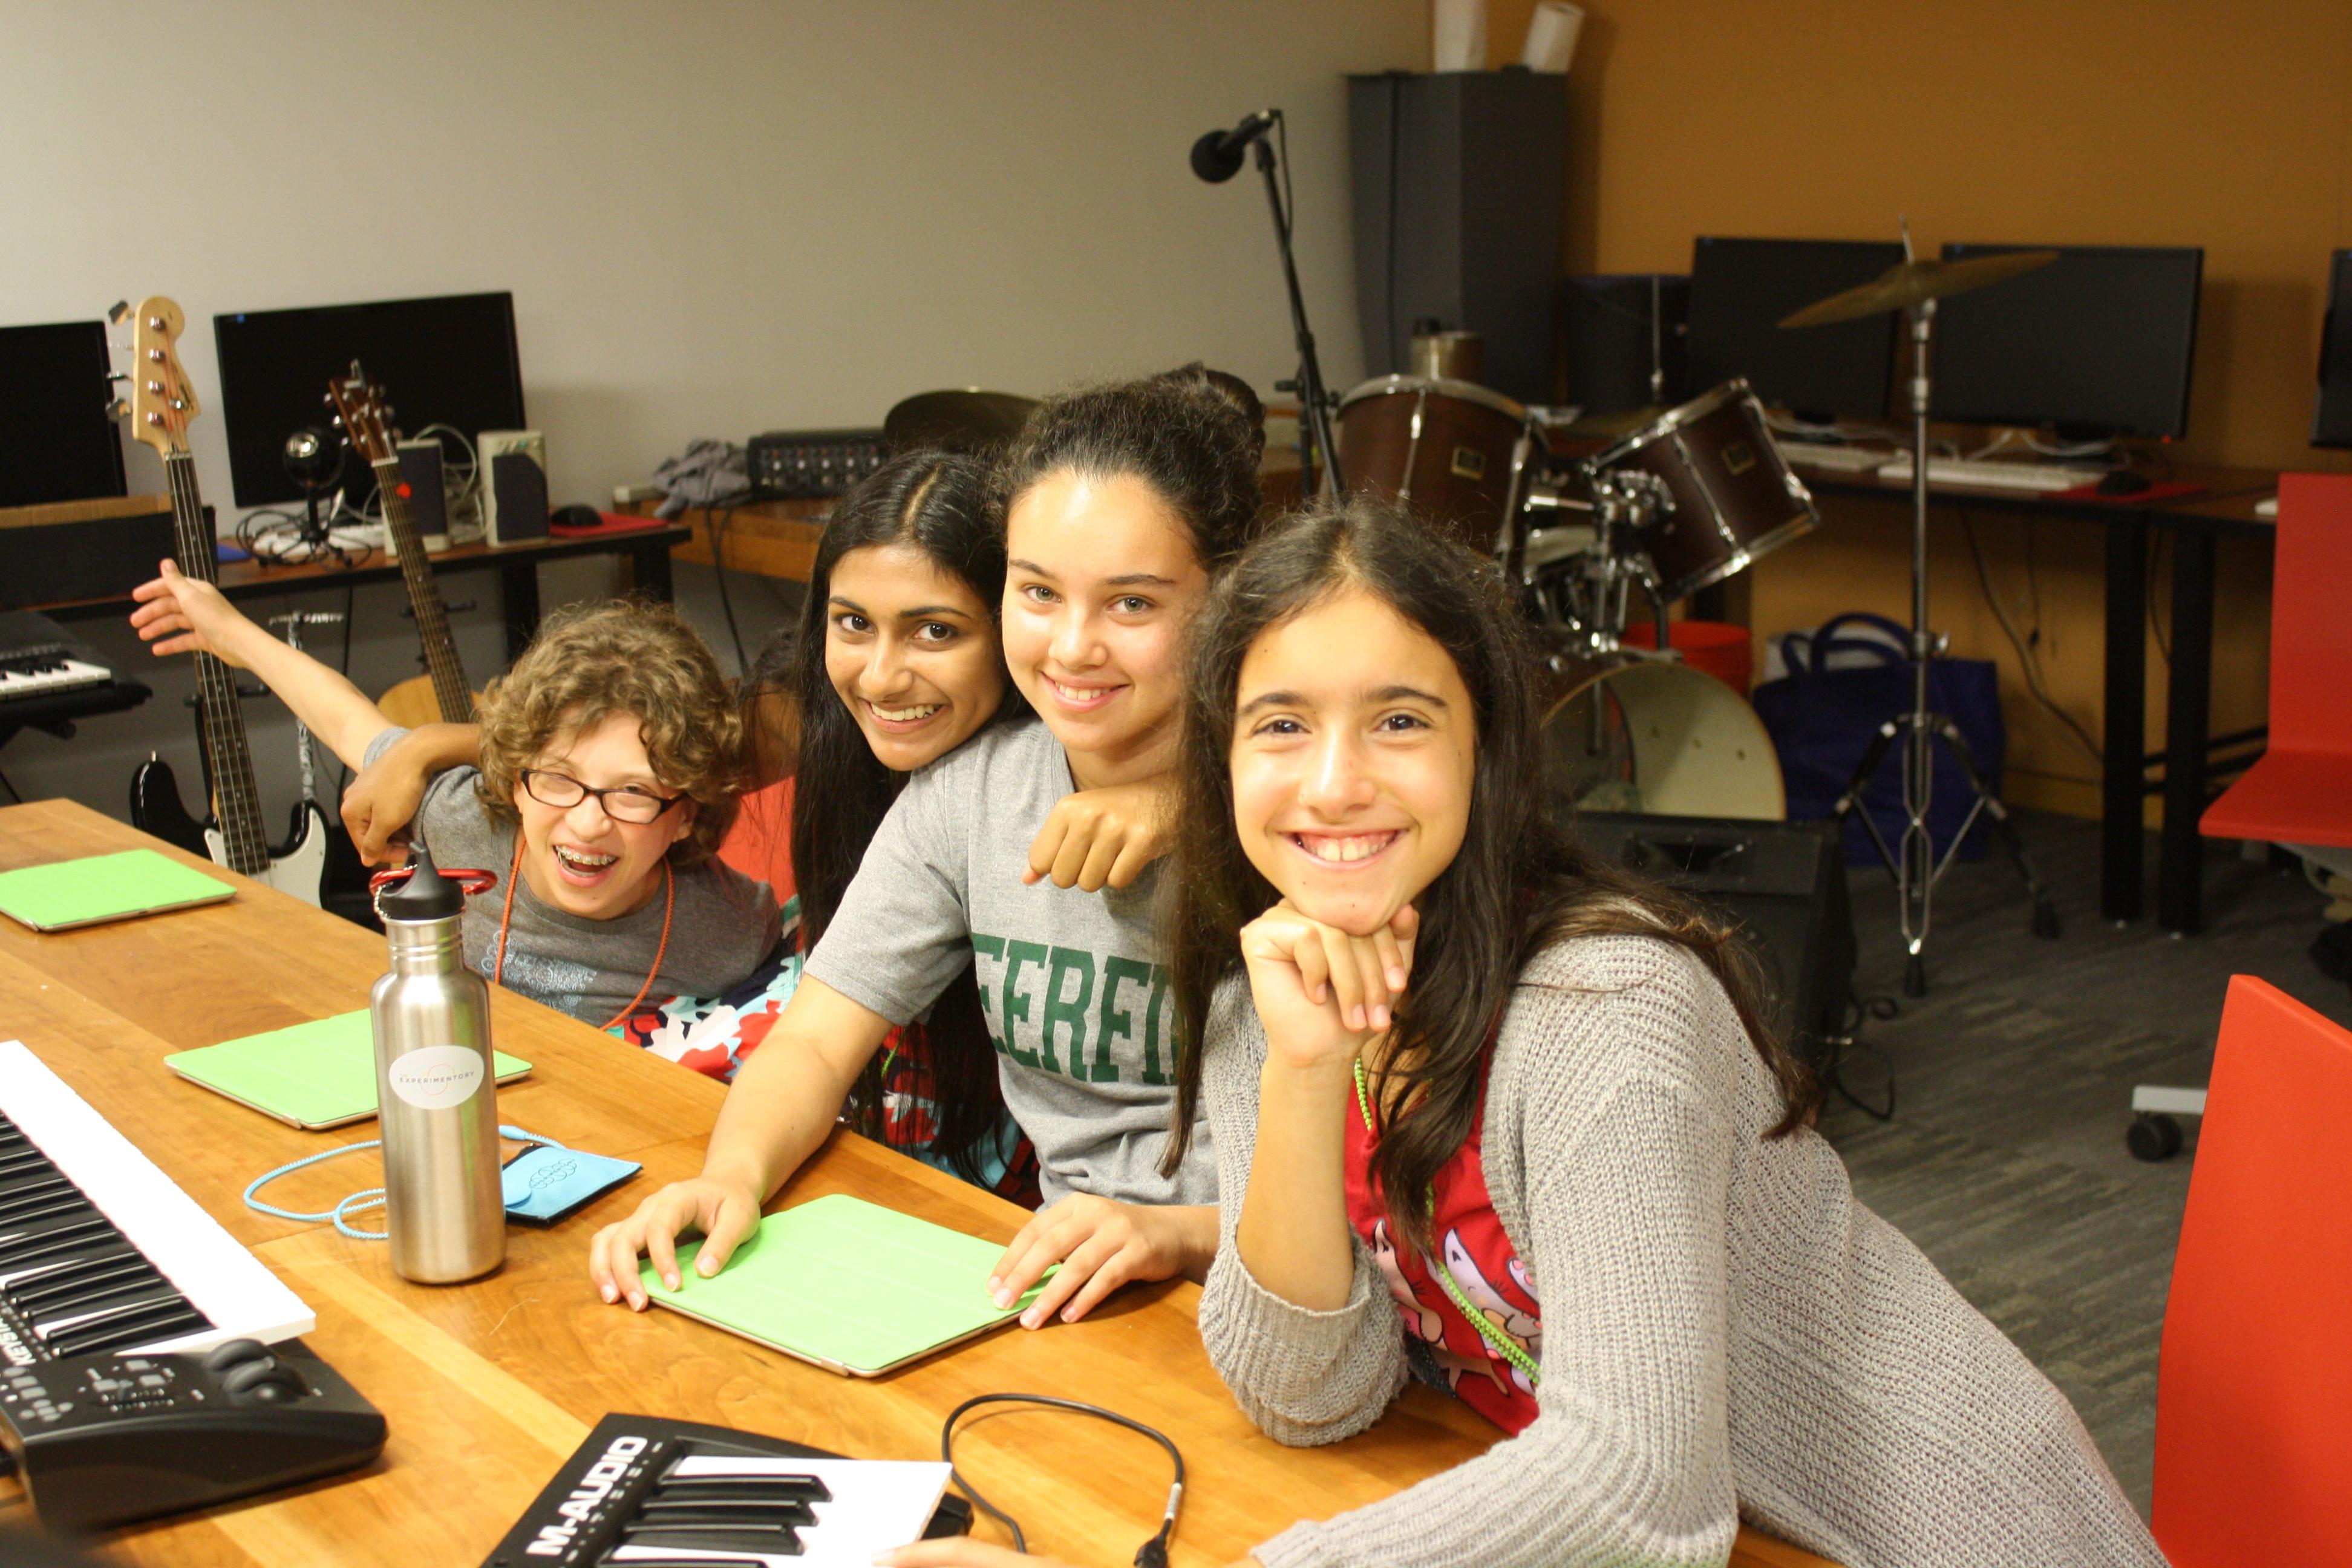 Some eighth grade girls having fun in composing in Garage Band in Music + Film class.